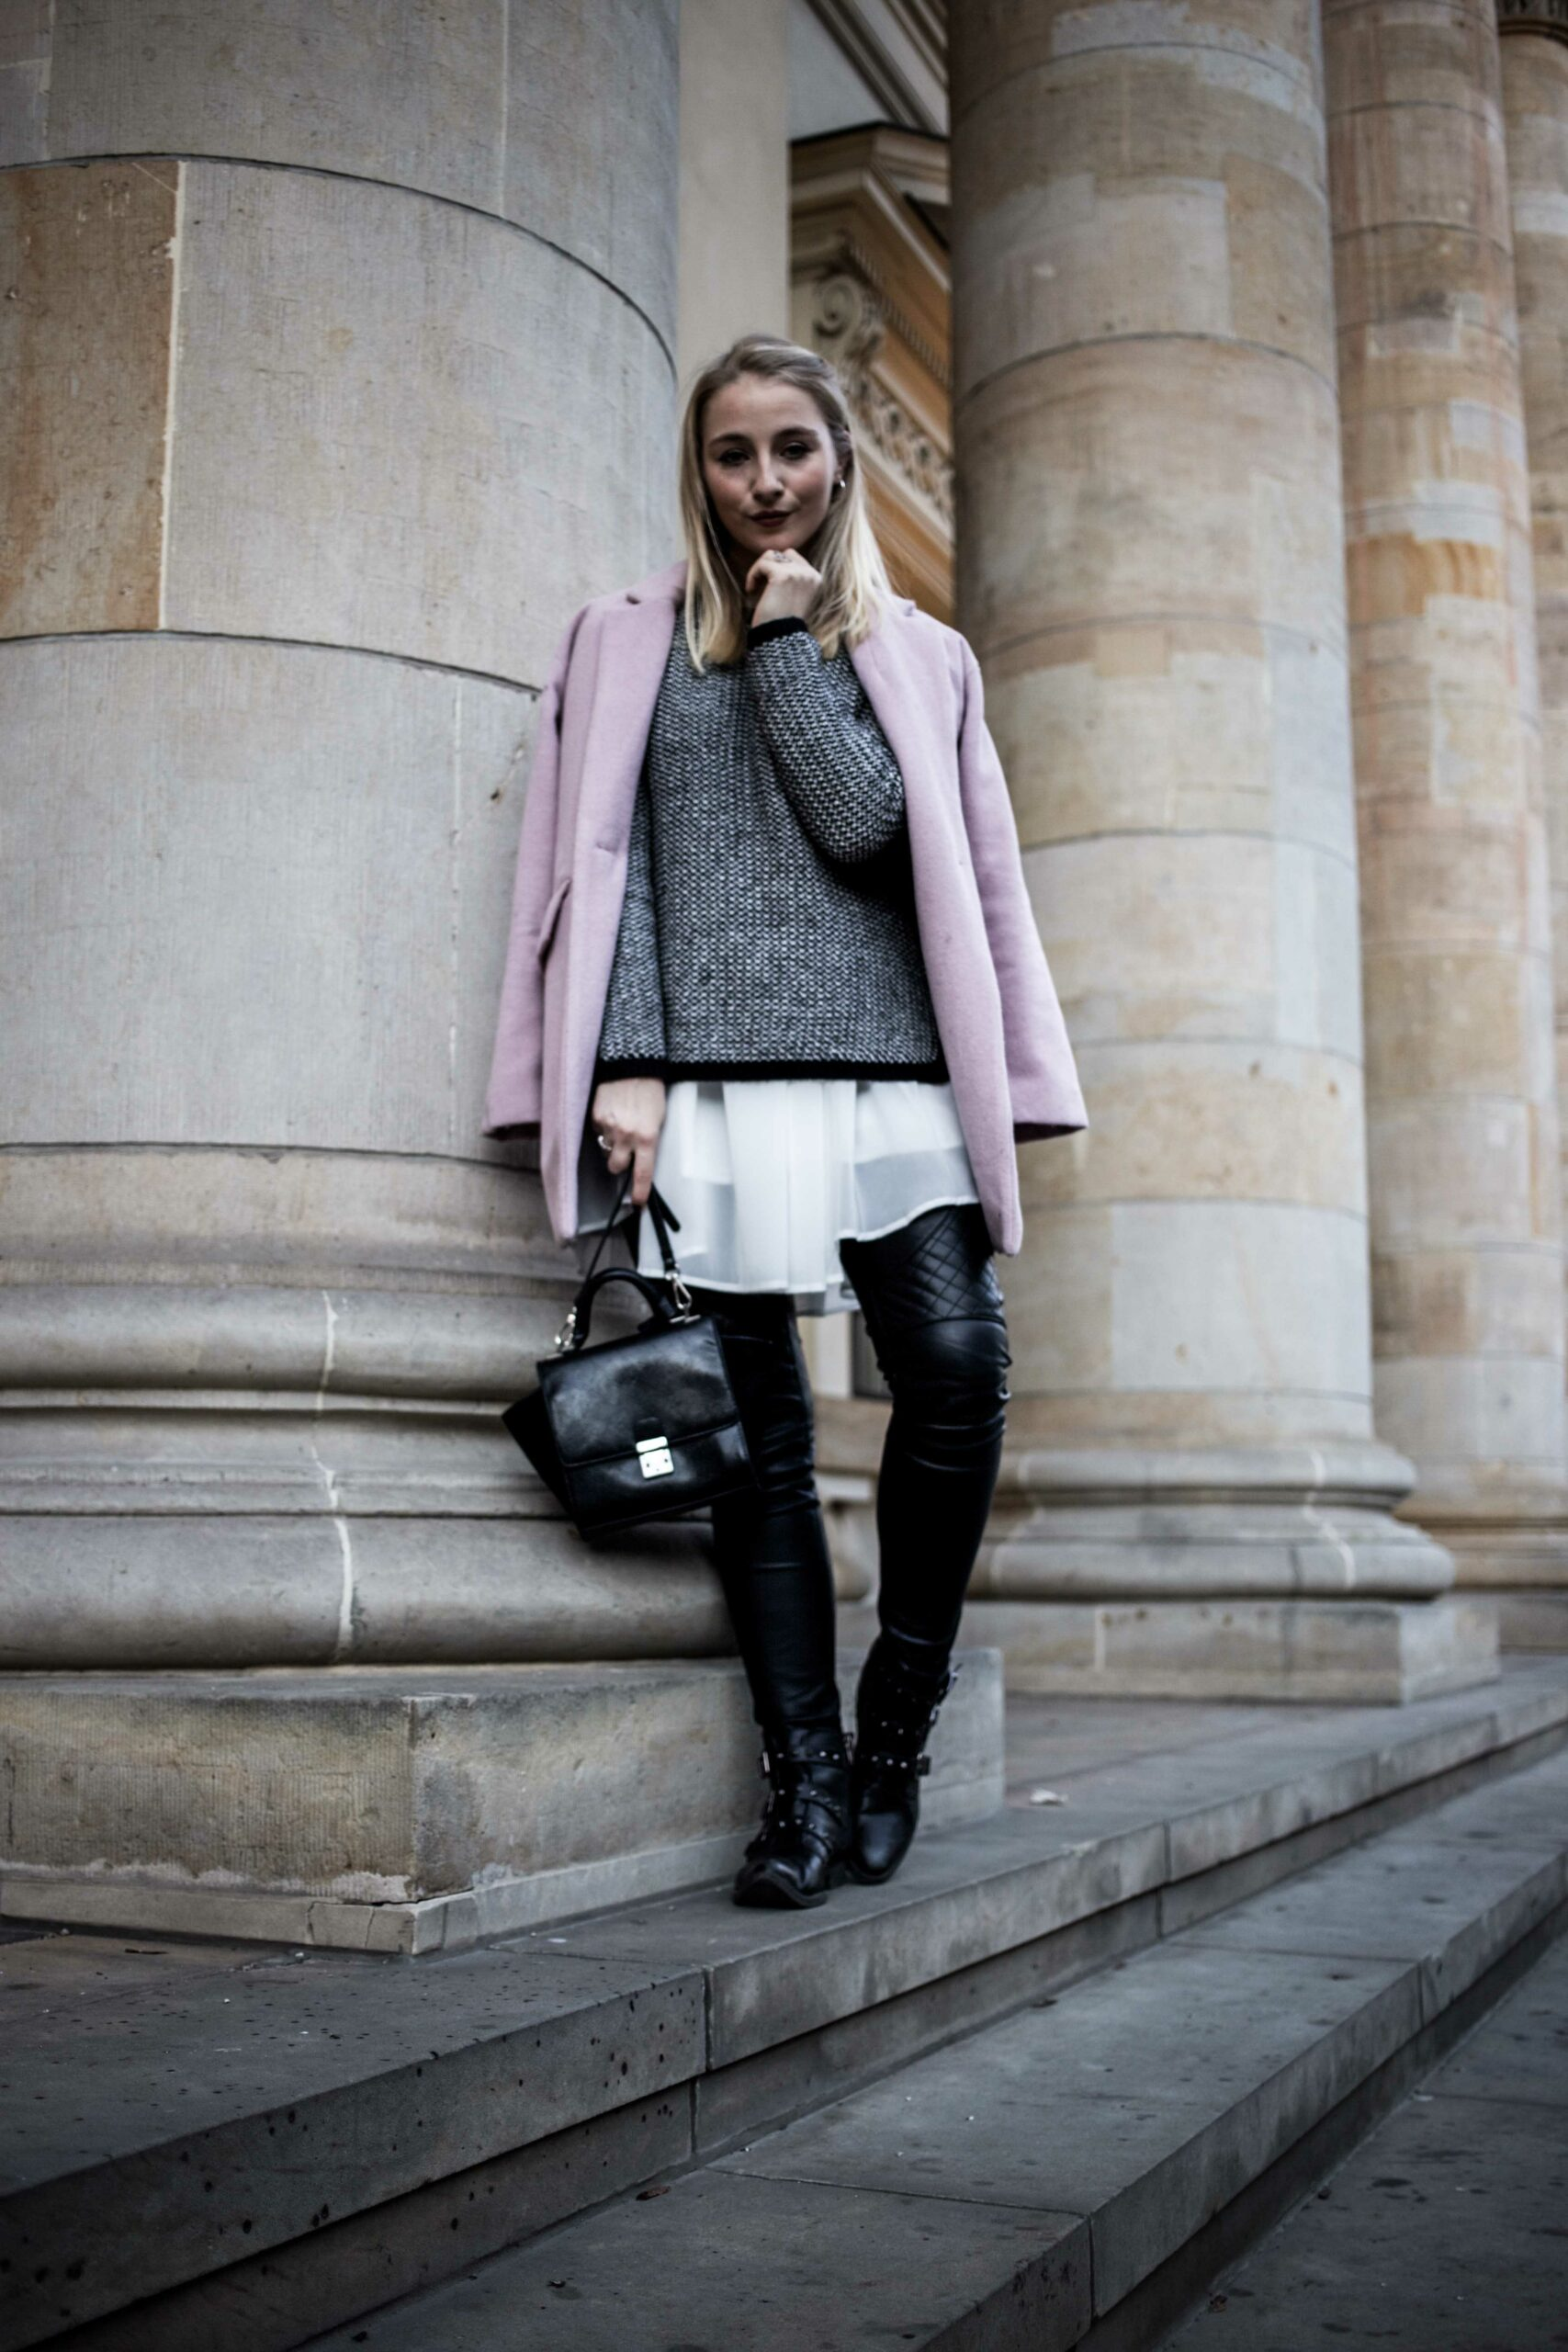 layering-outfit-biker-lederhose-thomas-sabo-schmuck-winter-outfit-berlin-fashionblog-modeblog_7506